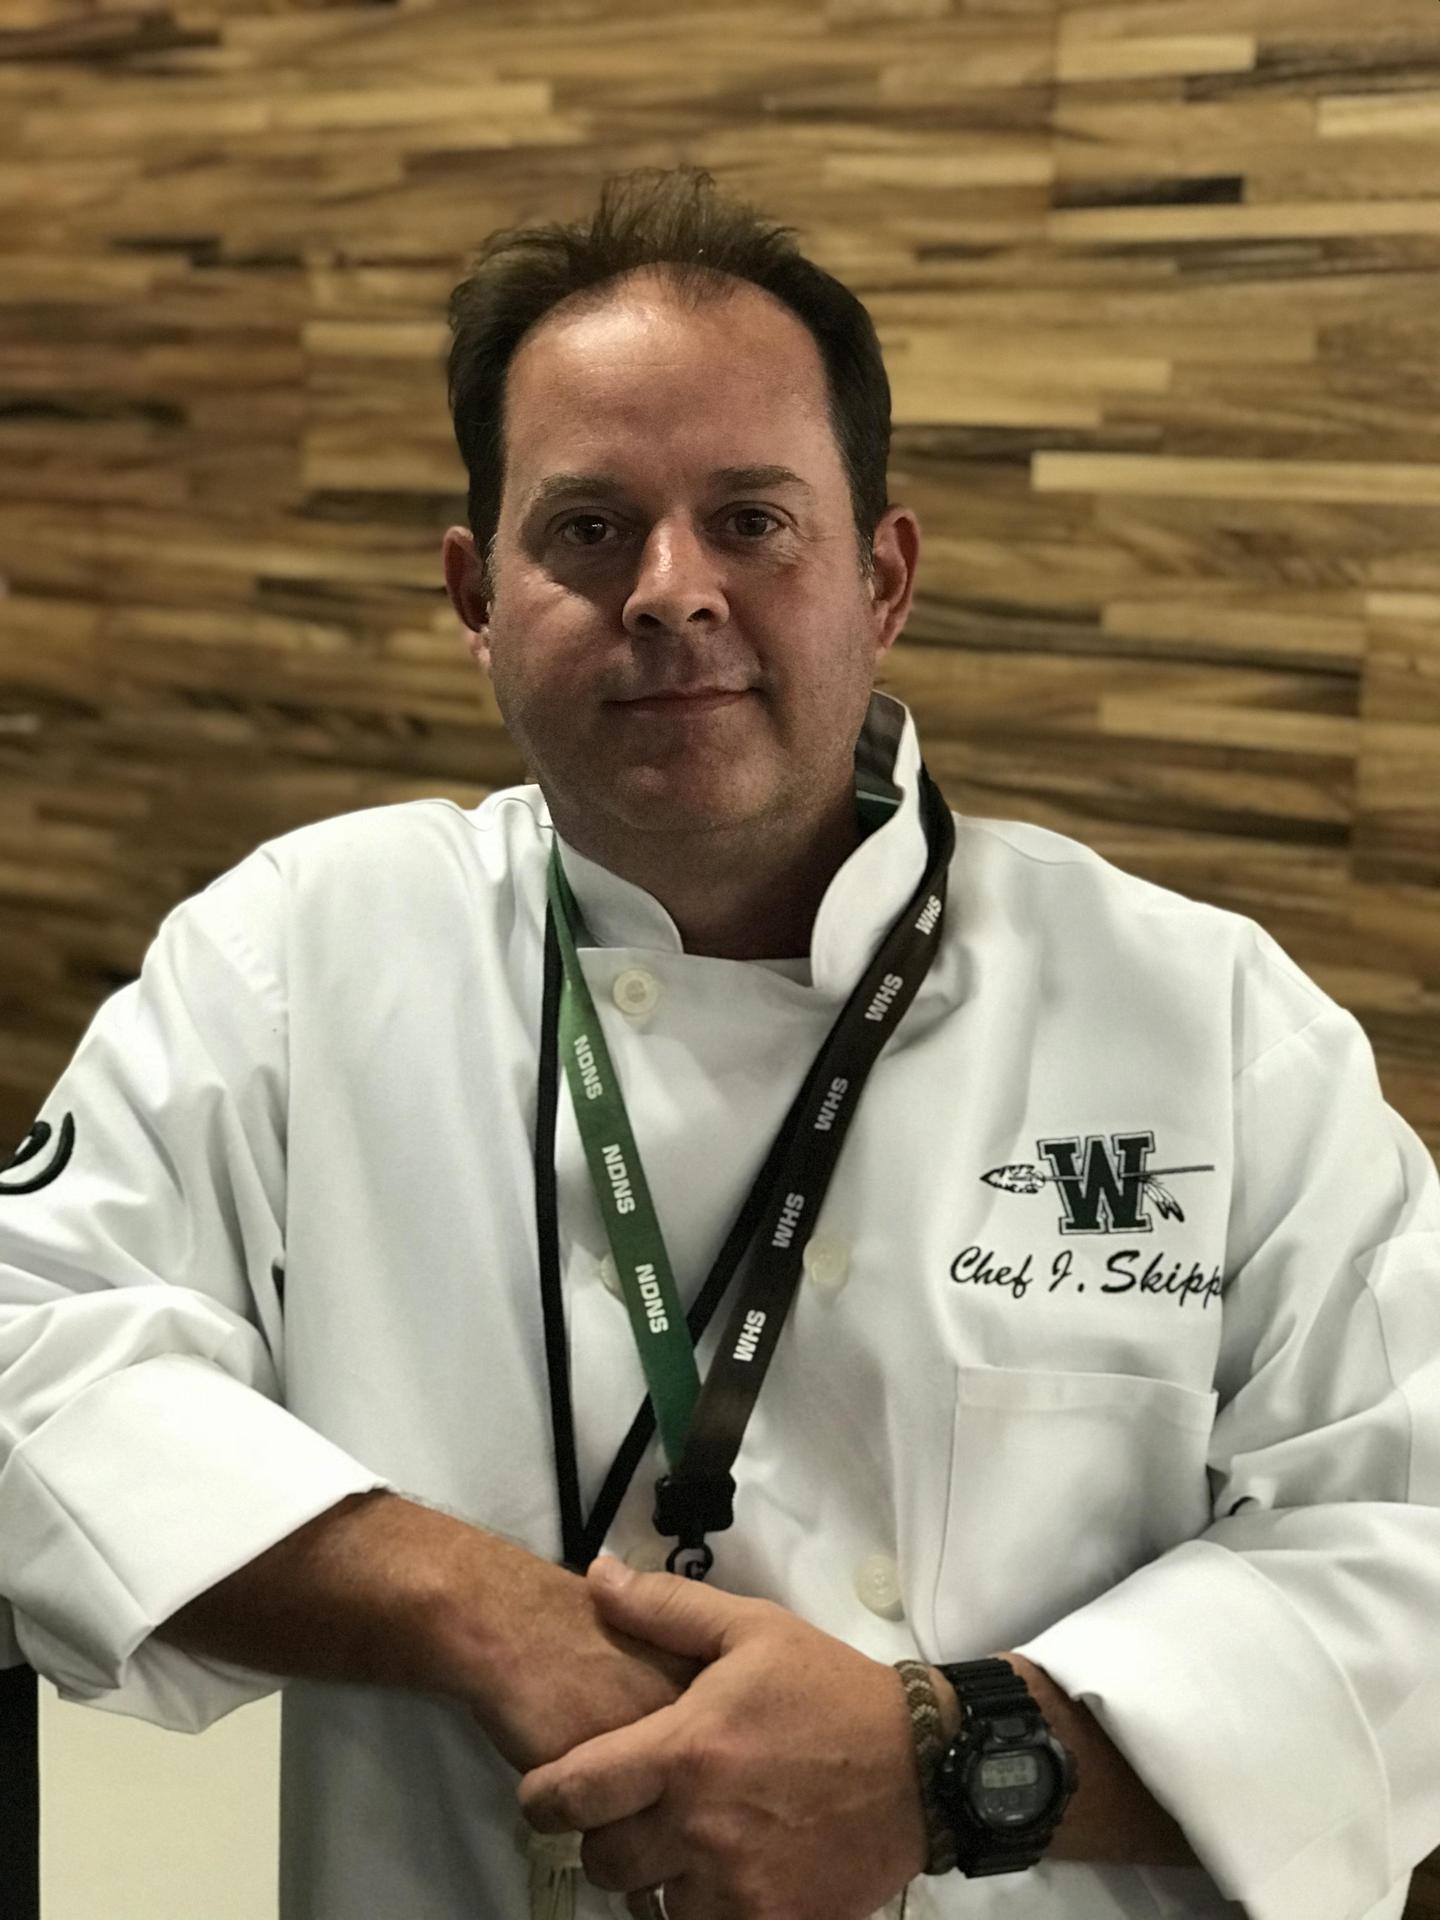 Chef Joel Skipper headshot